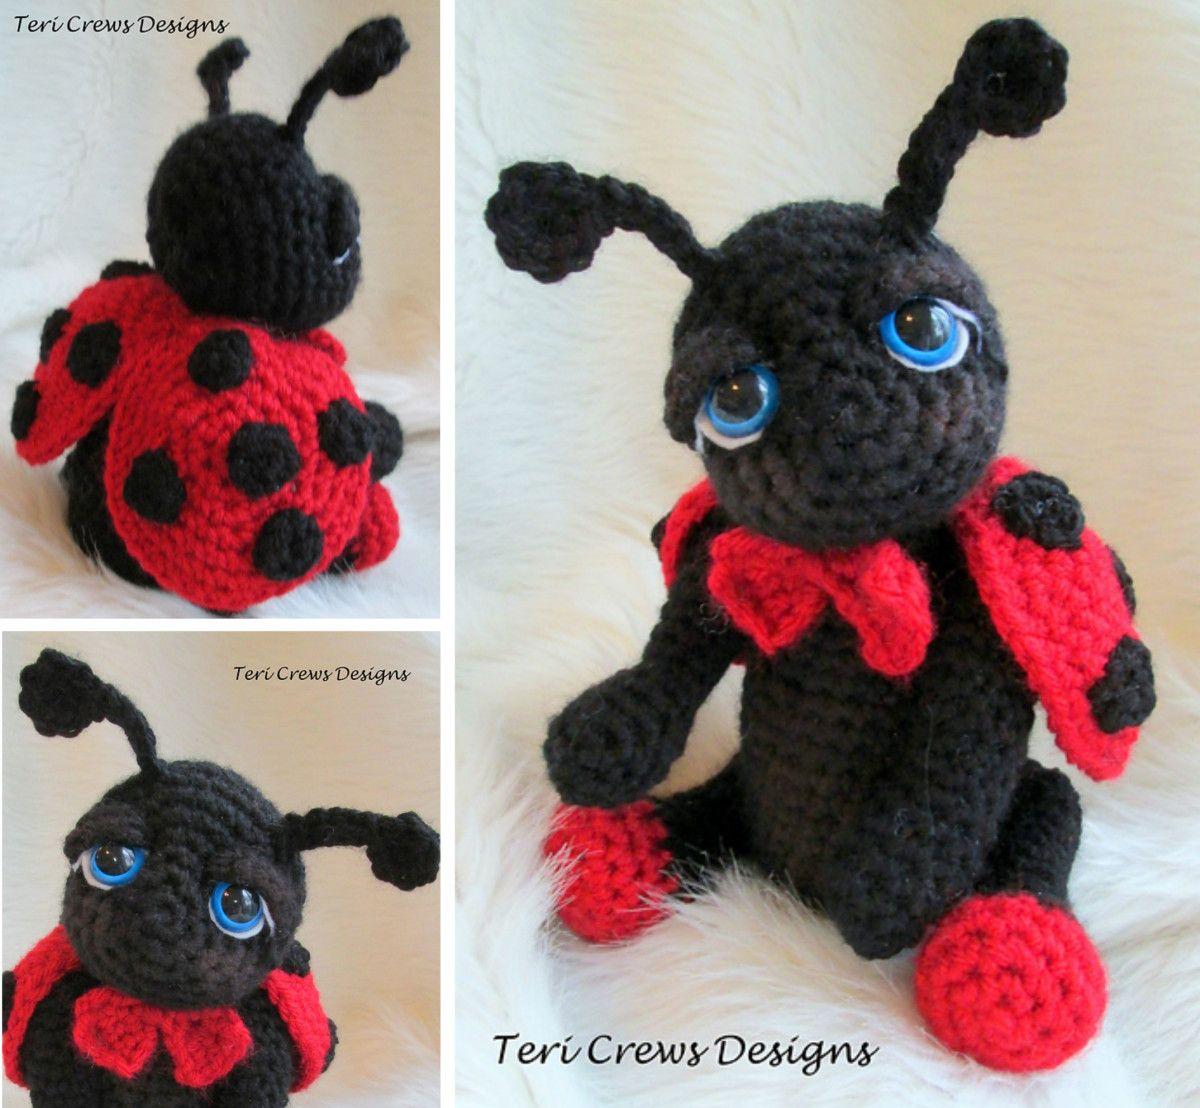 Ladybug crochet pattern cute ideas easy video tutorial crochet crochet ladybug amigurumi free pattern bankloansurffo Choice Image